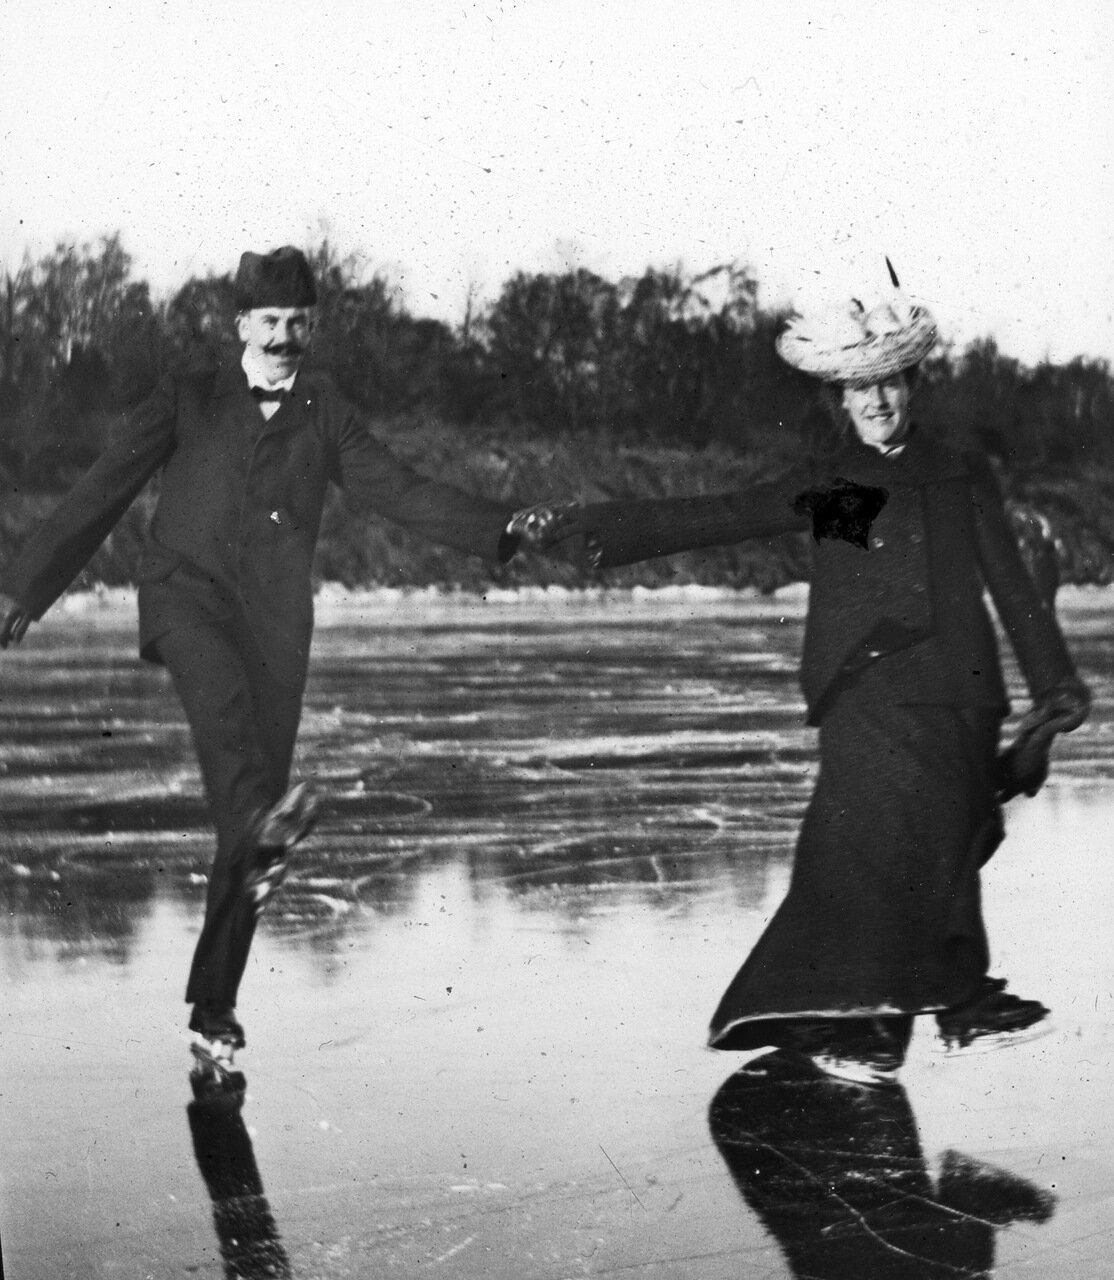 Неизвестная пара на льду, вероятно за пределами Неттрабу, Швеция 1909 г.